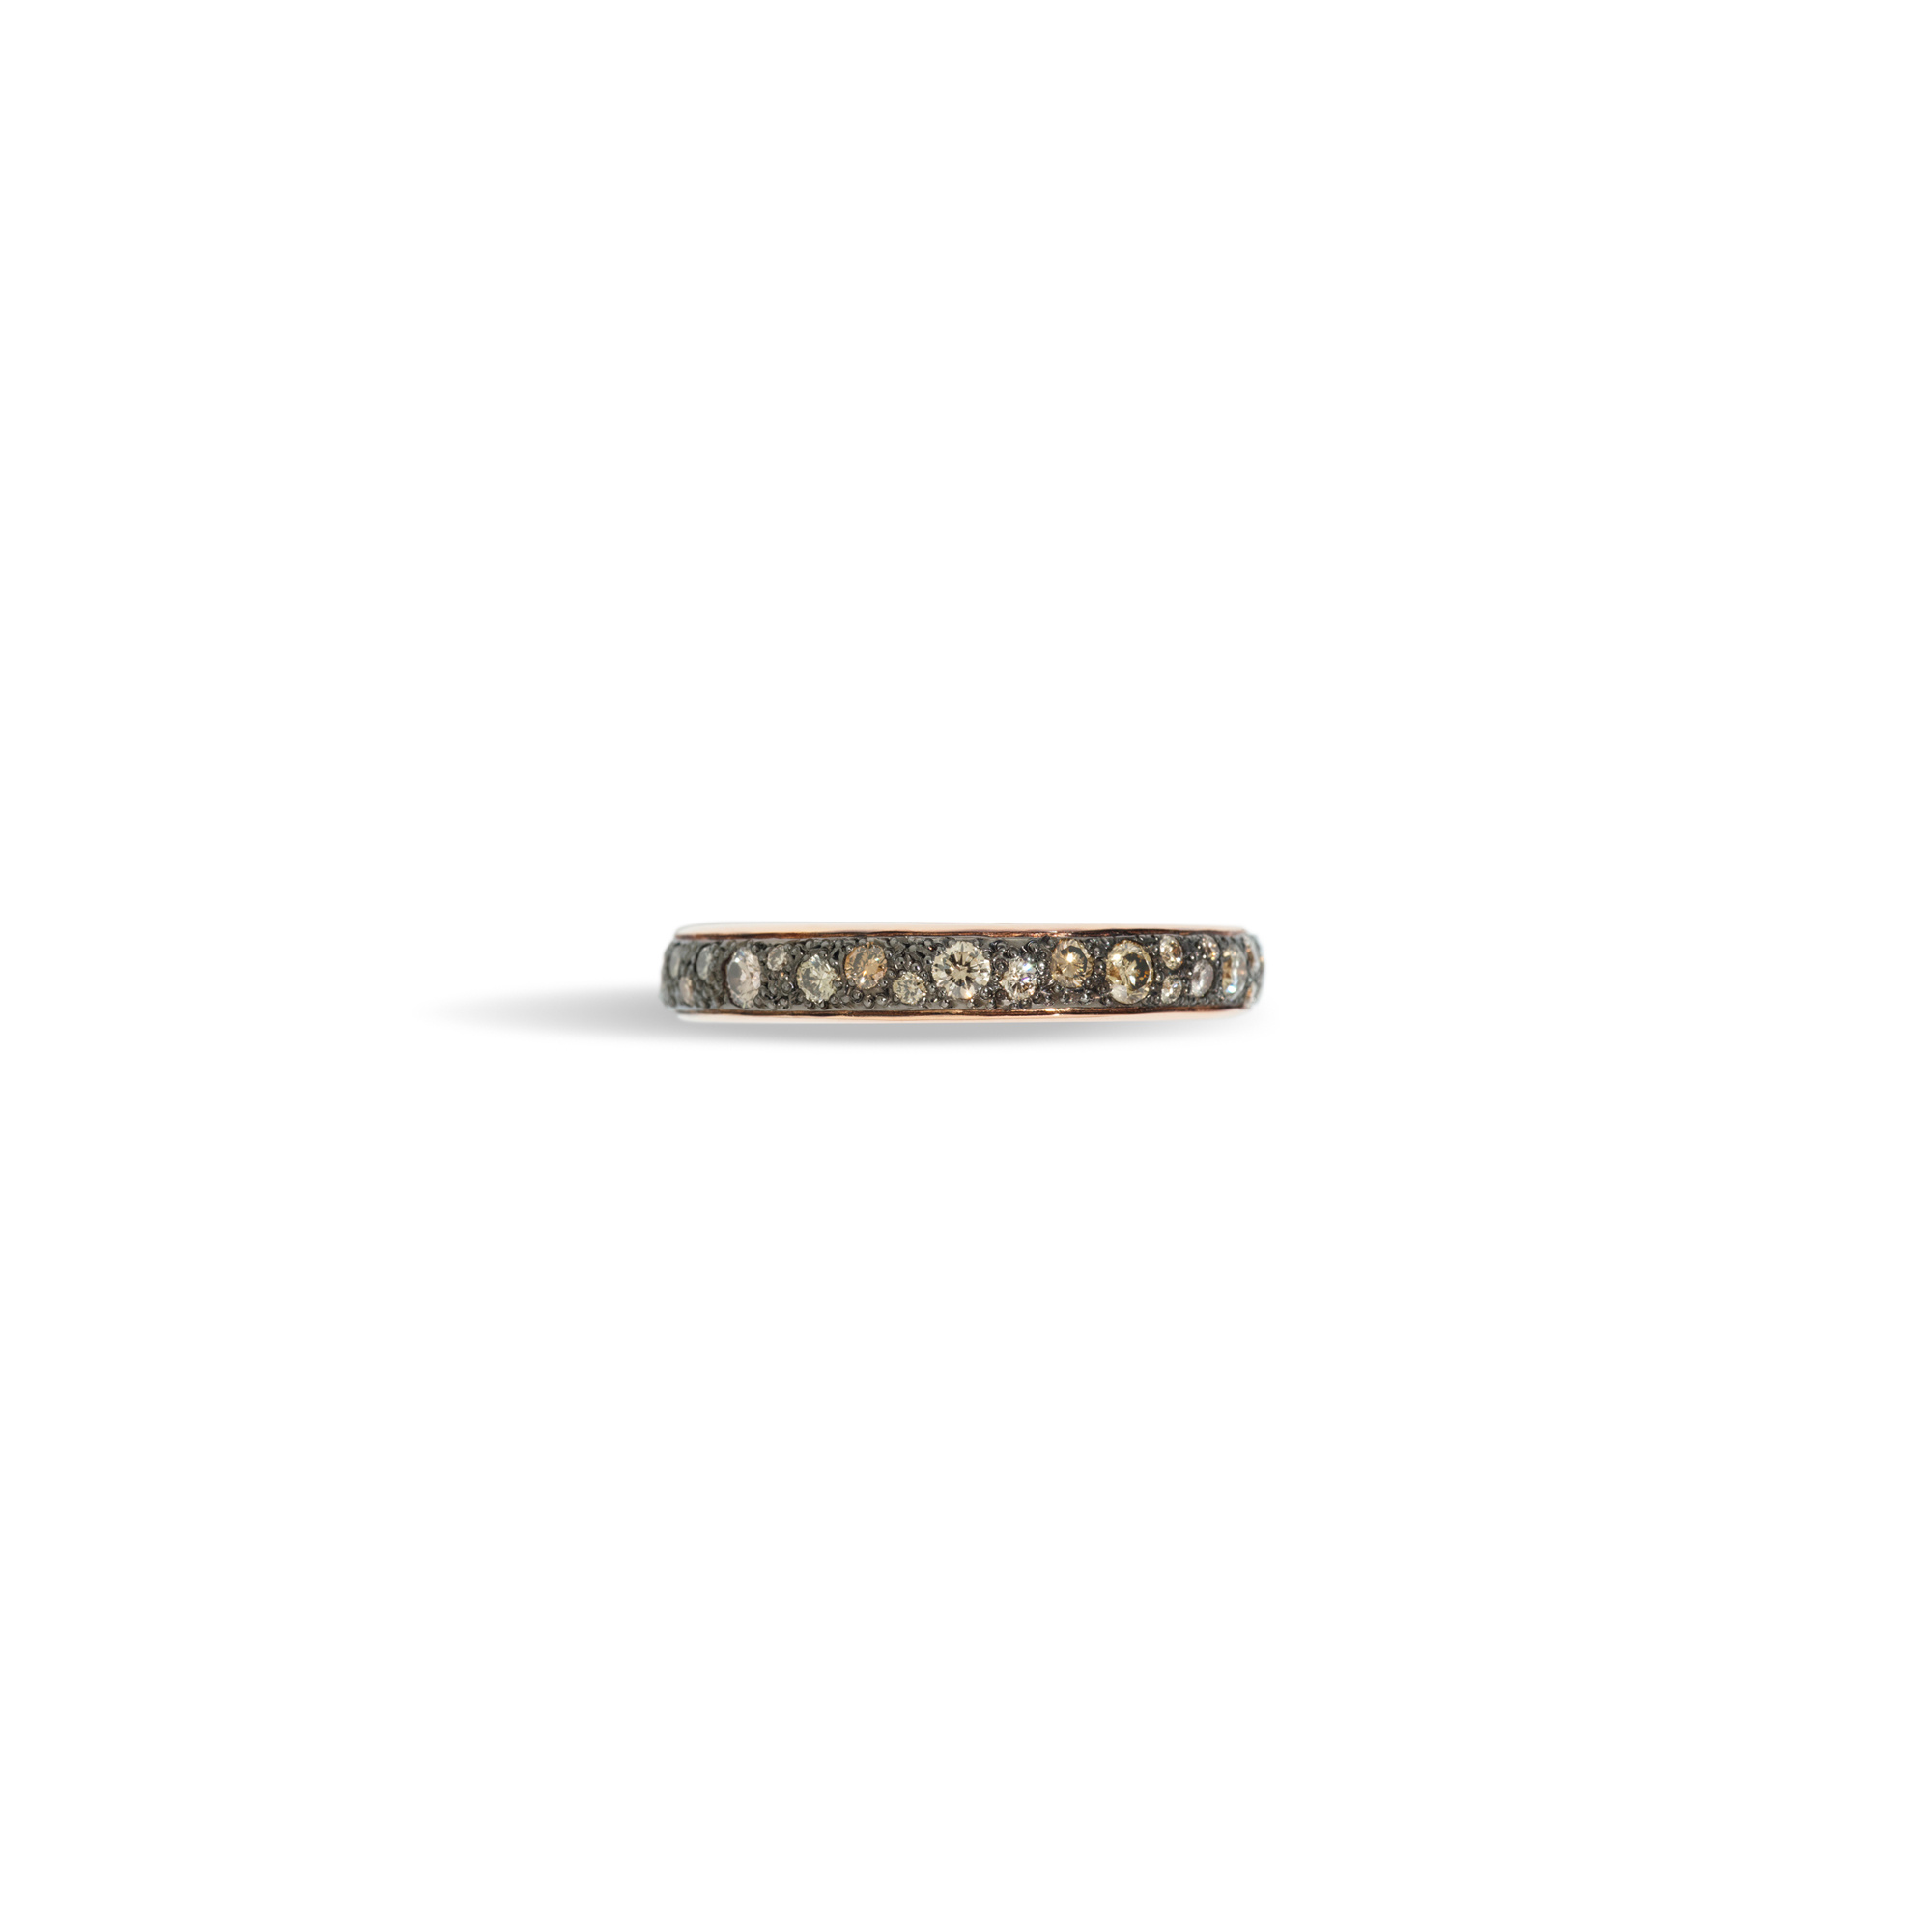 Pomellato Pomellato Iconica 18k Rosegouden Ring met cognac diamanten pavé gezet